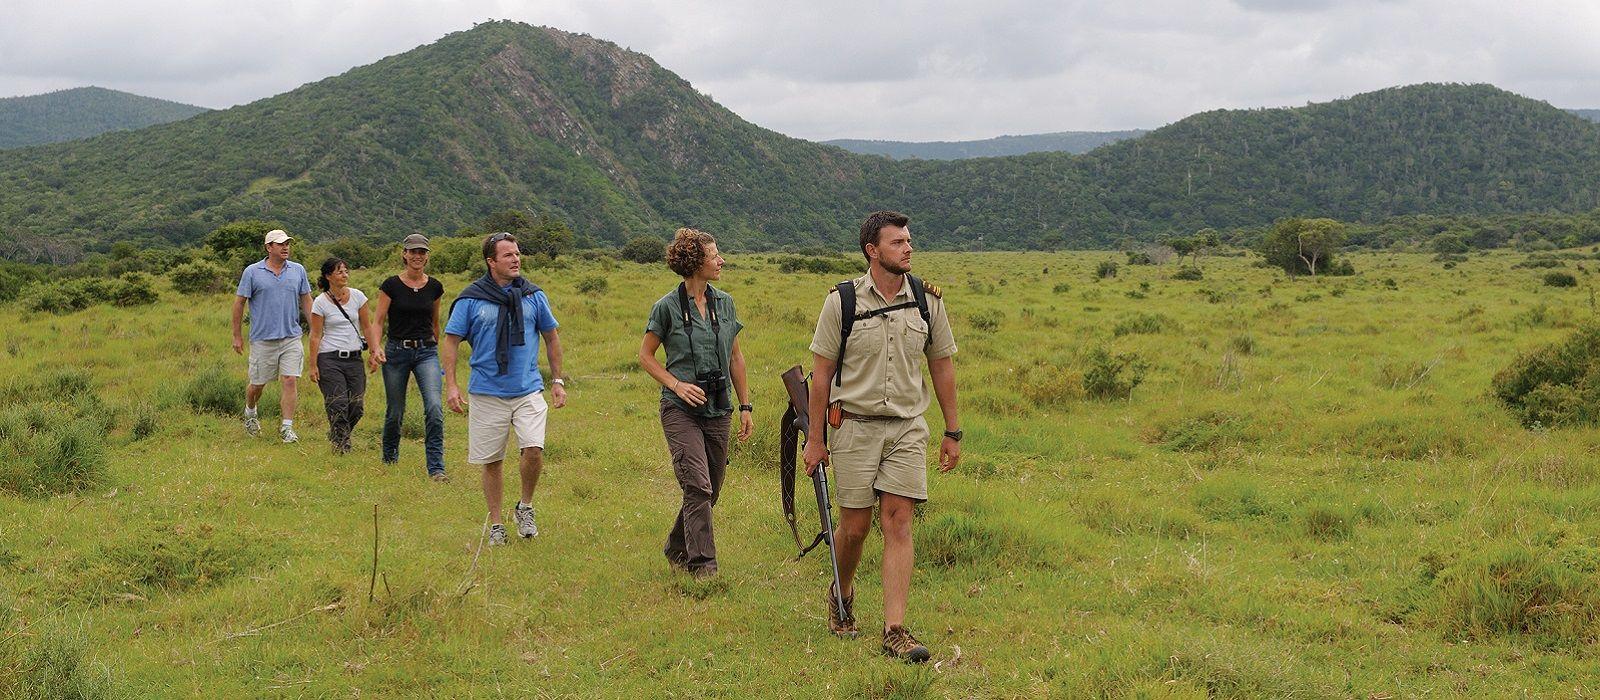 Reiseziel Östliche Wild Coast – Wanderrouten Südafrika